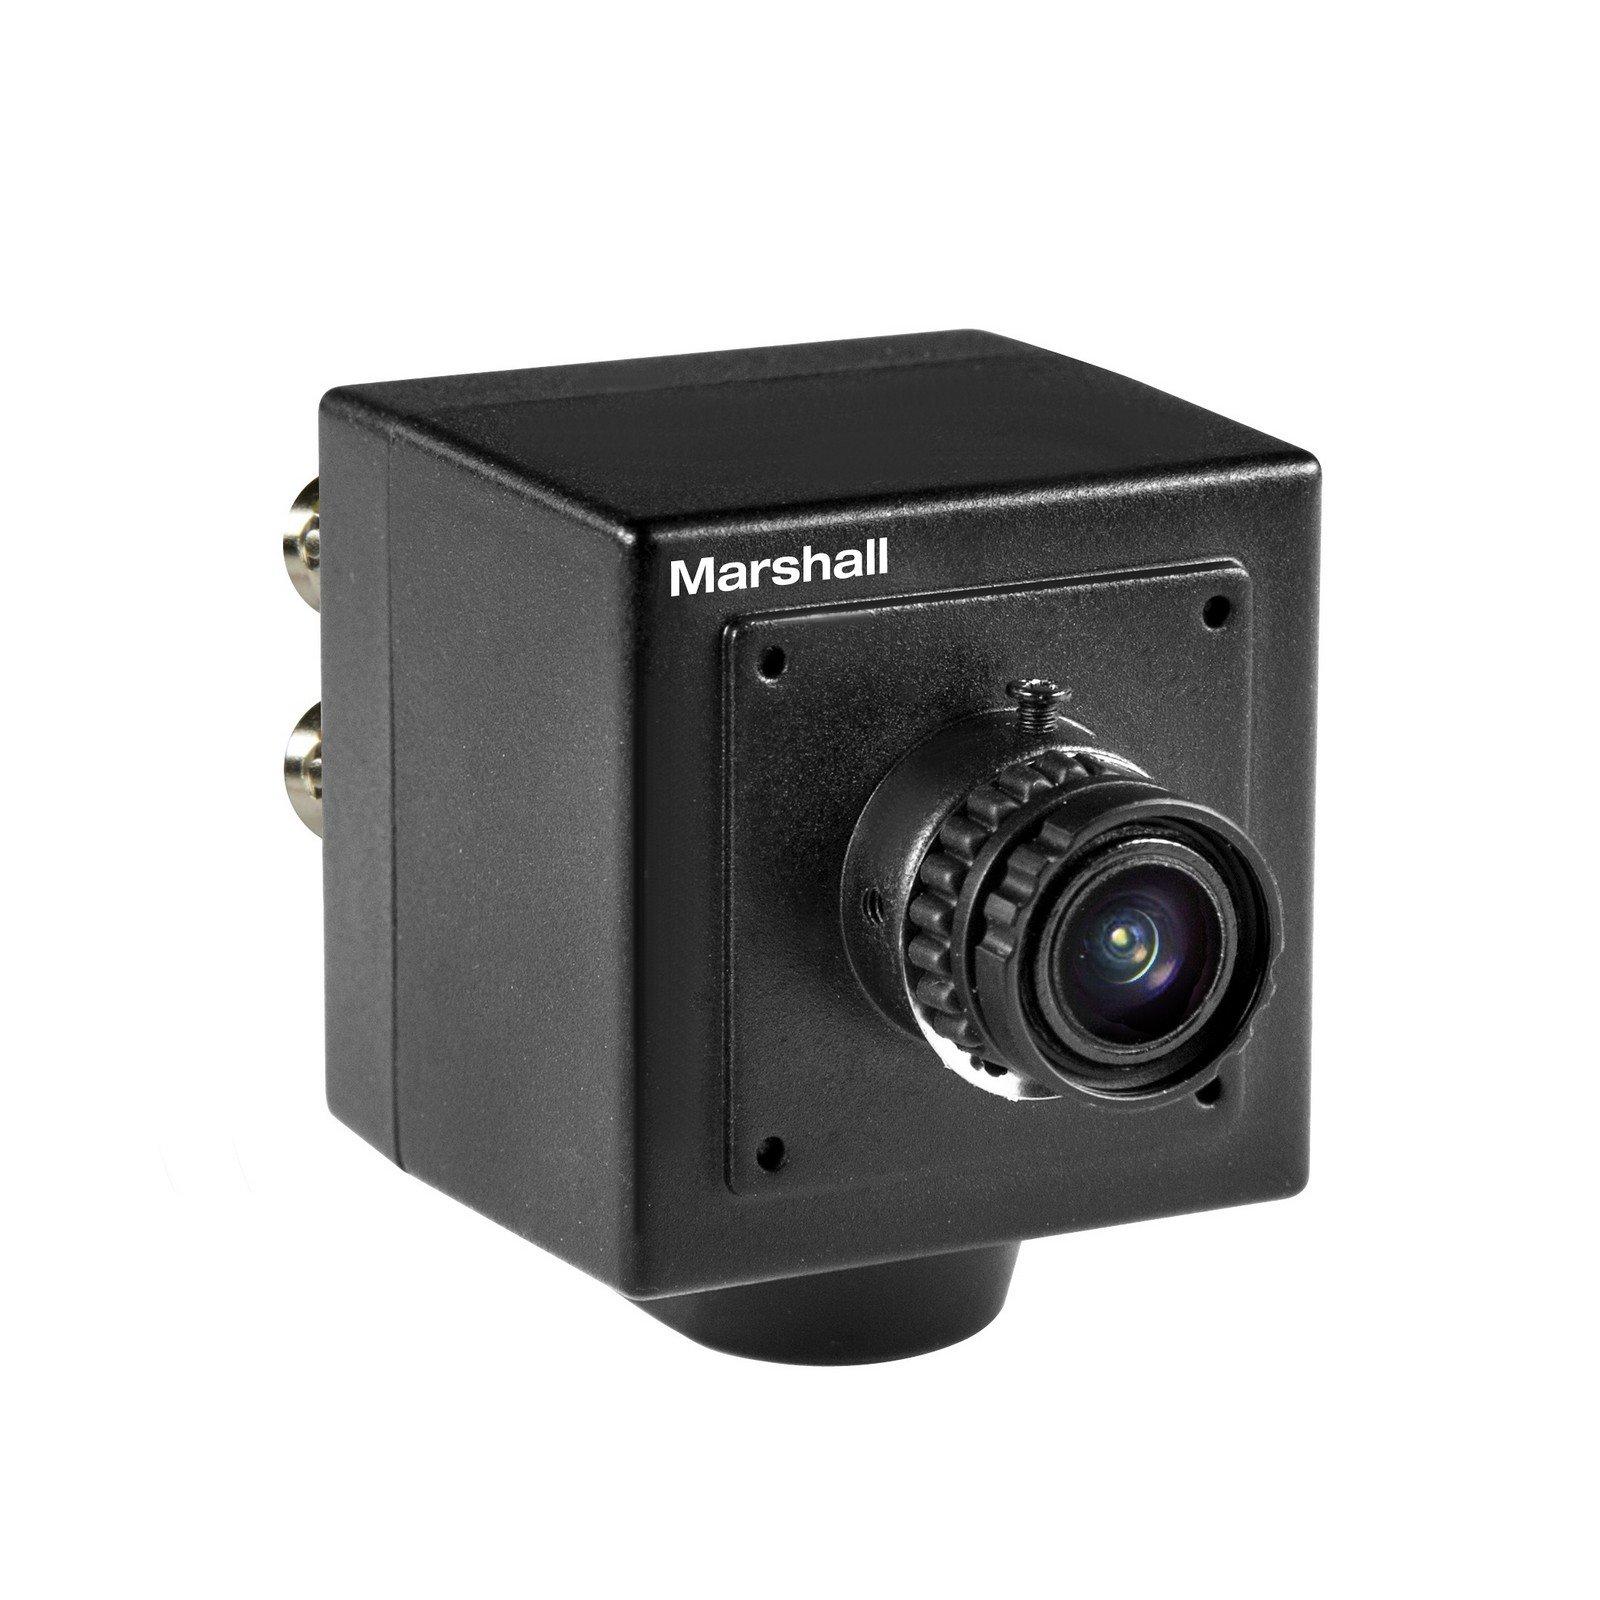 Marshall Electronics CV502-MB | Interchangeable 3.7mm Lens HD 3G SDI 1080p 59 FPS Compact Broadcast Camera